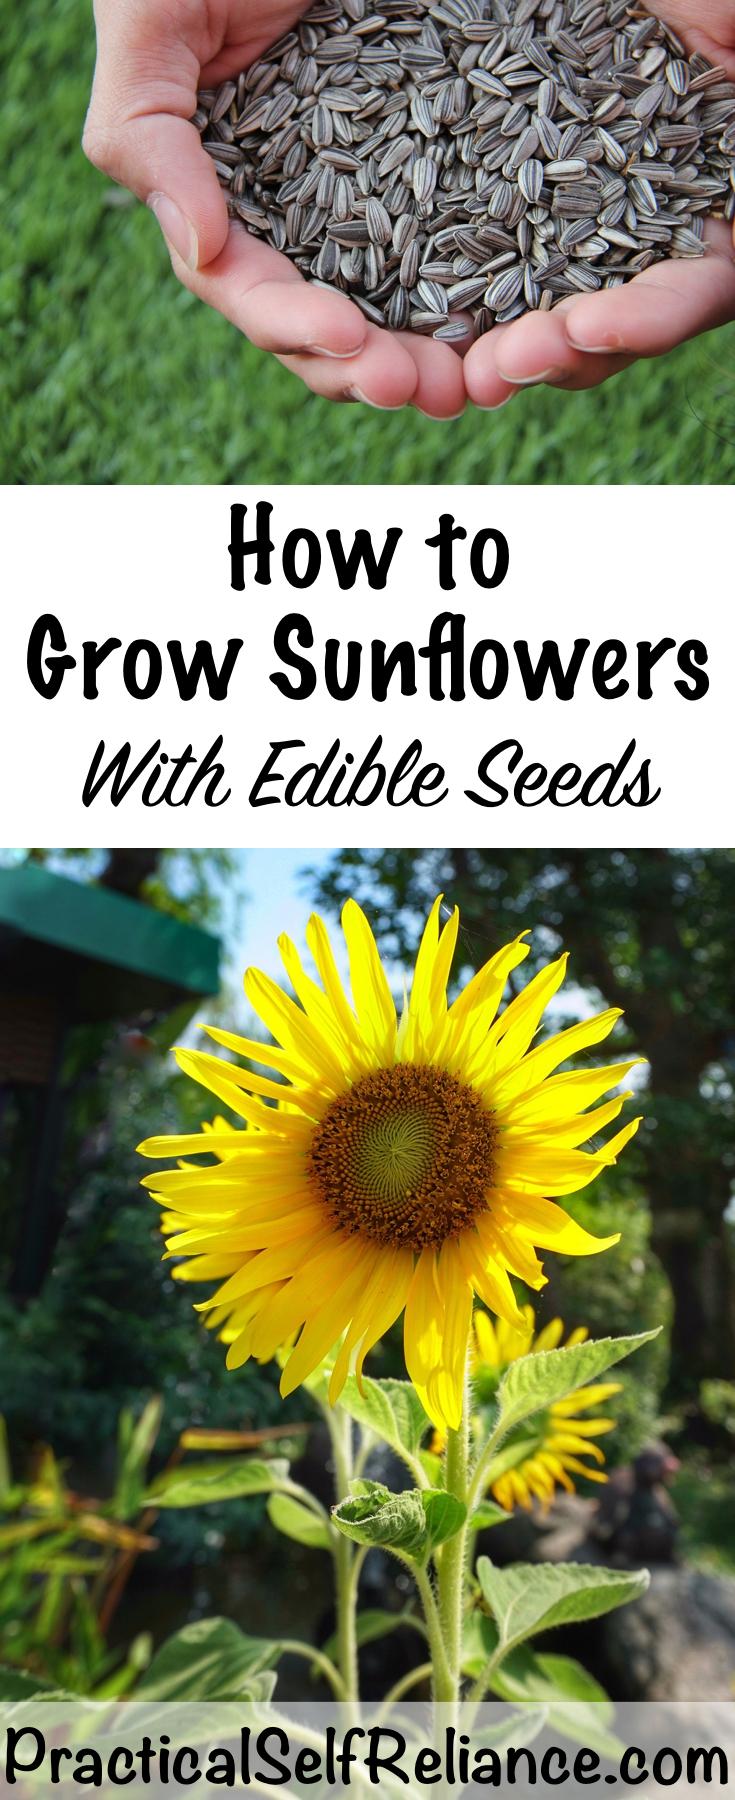 How to Grow Sunflowers for Seeds ~ Grow Edible Sunflower Seeds